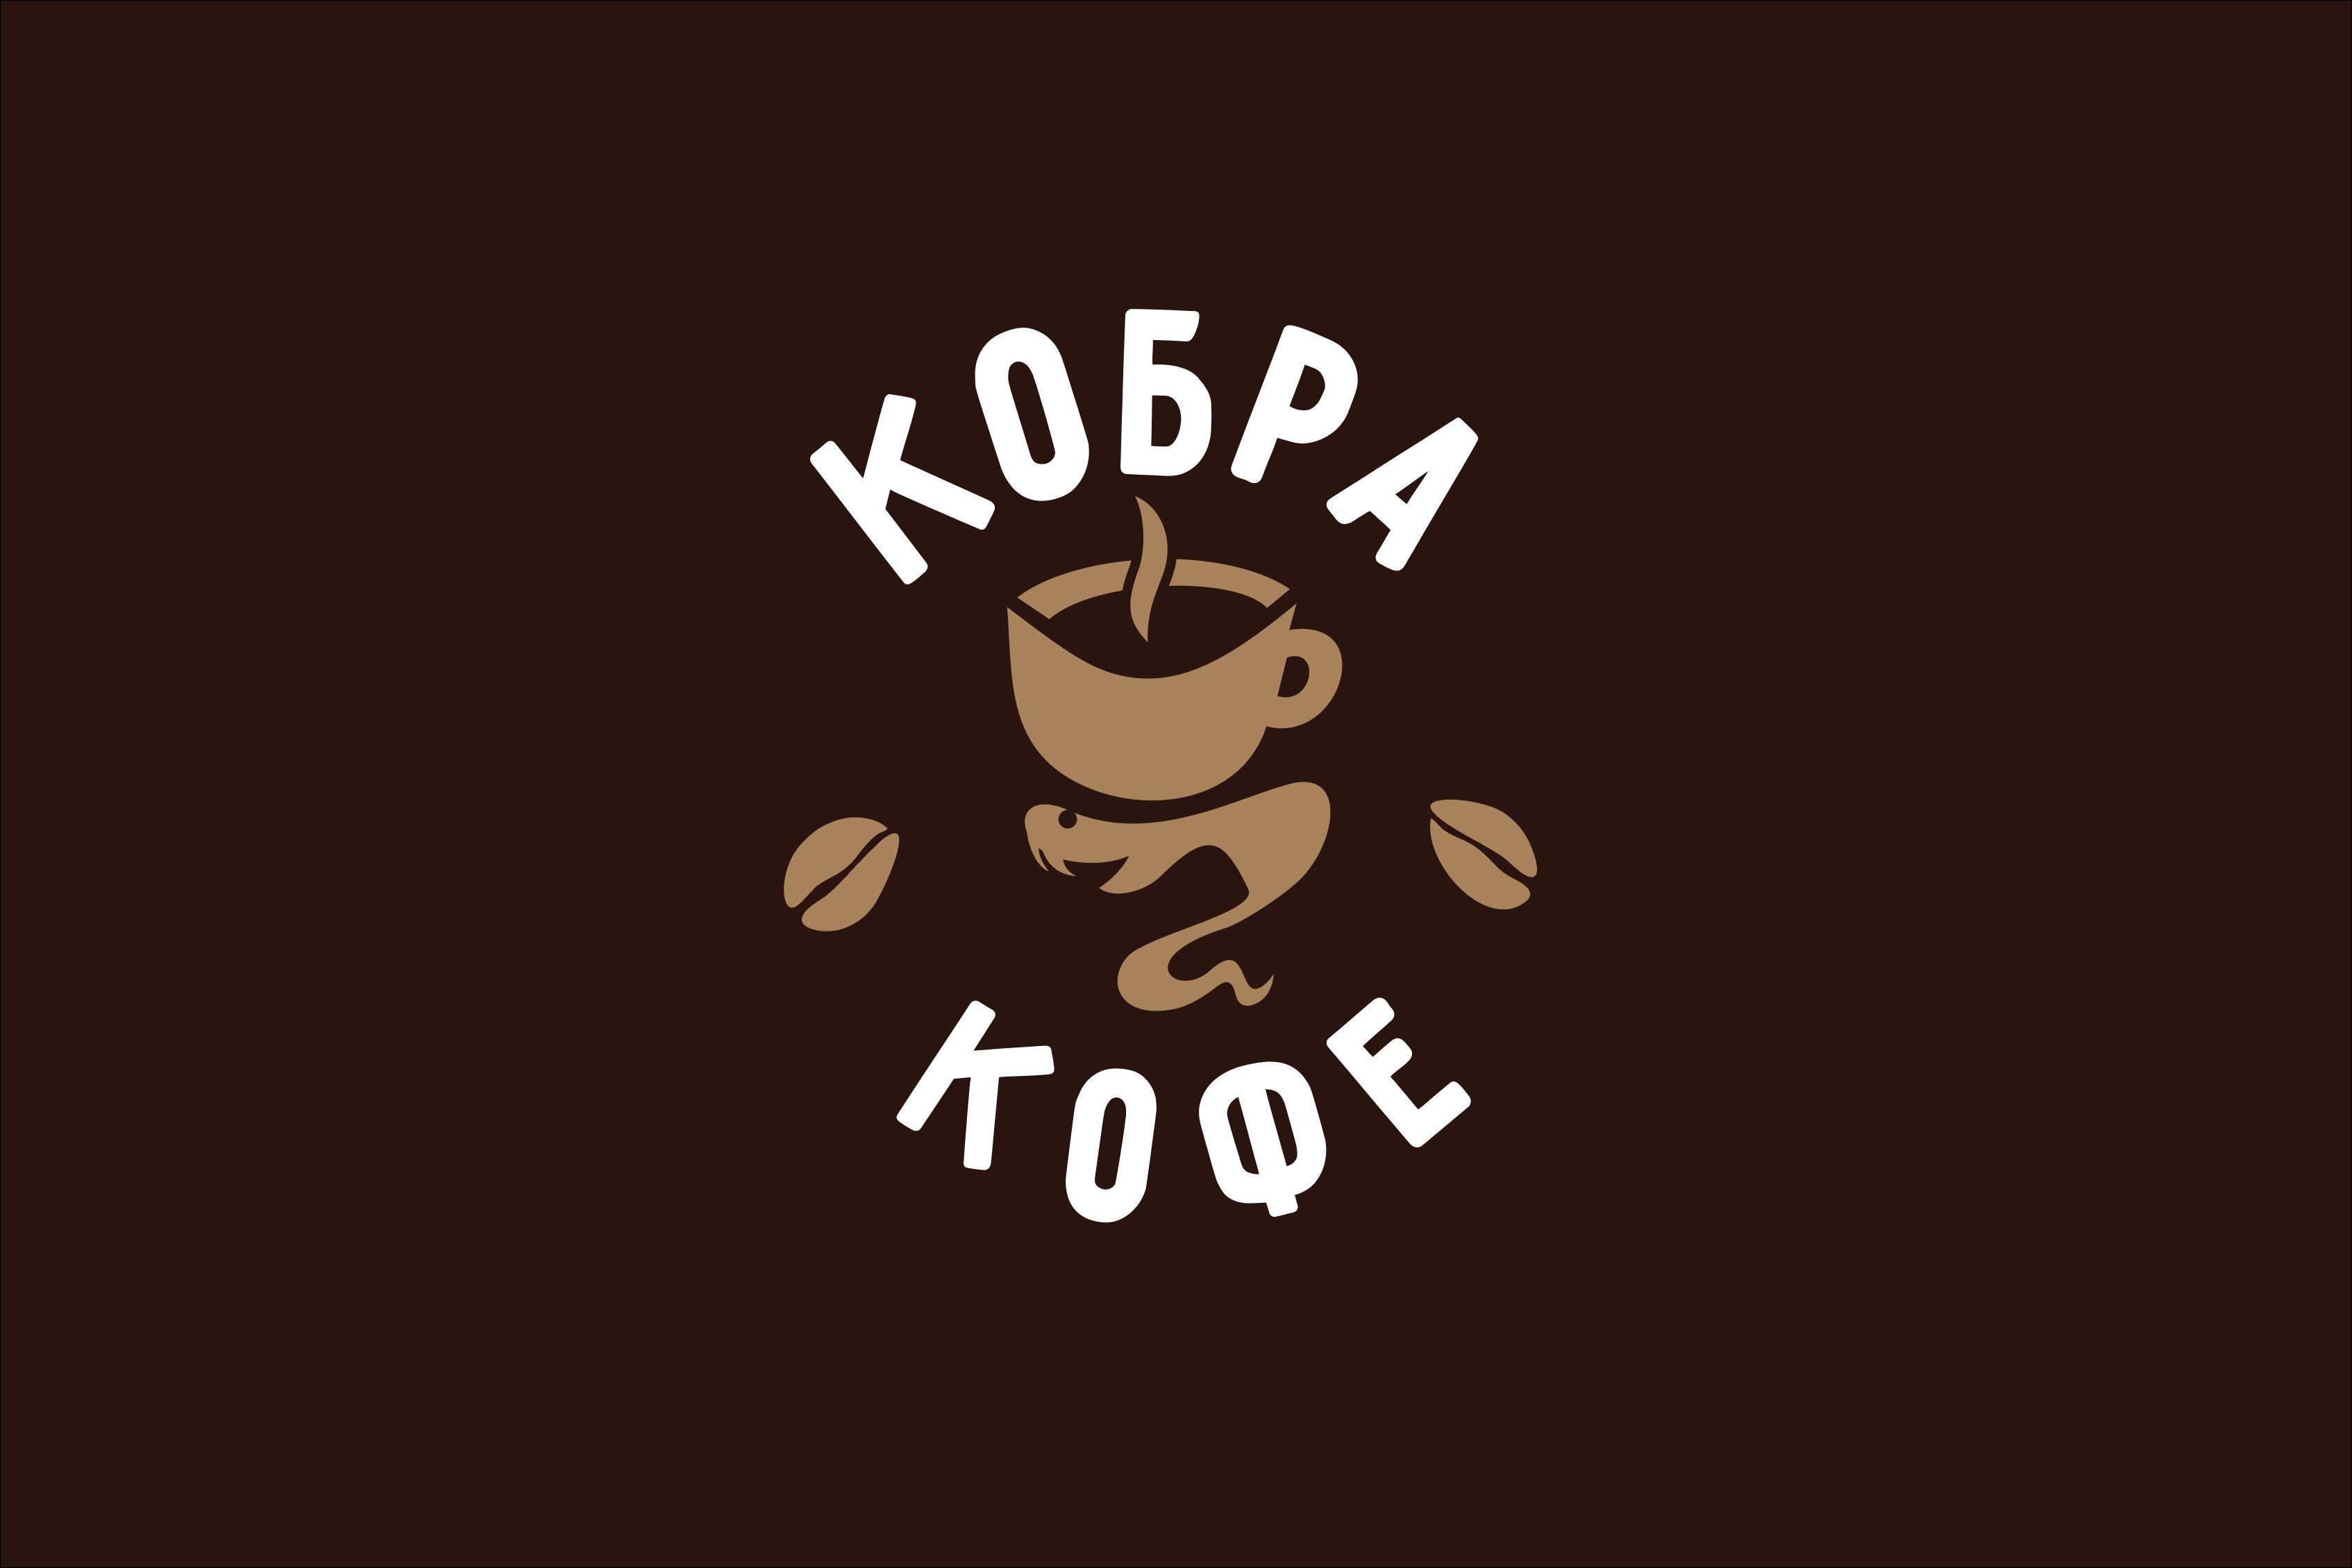 Название, цвета, логотип и дизайн оформления для сети кофеен фото f_1425ba7fc74d2605.jpg